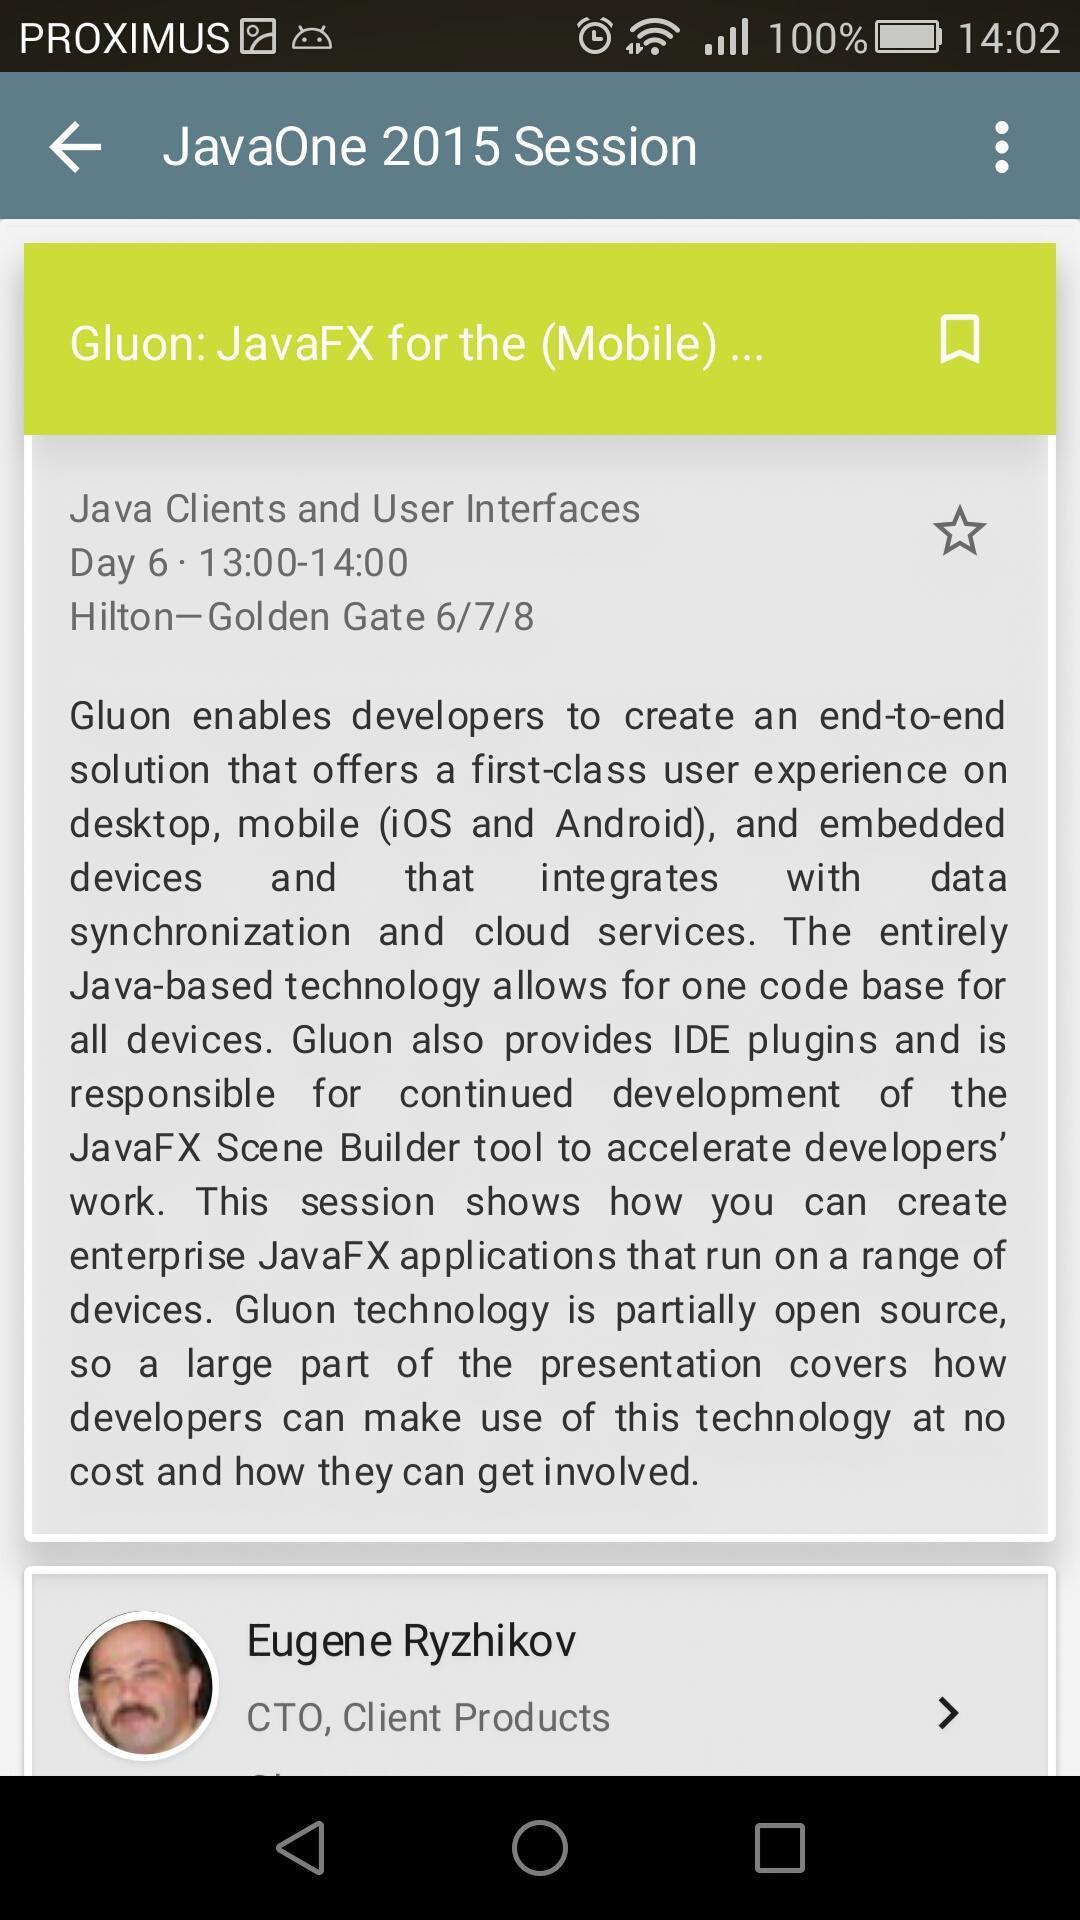 Gluon Javafx